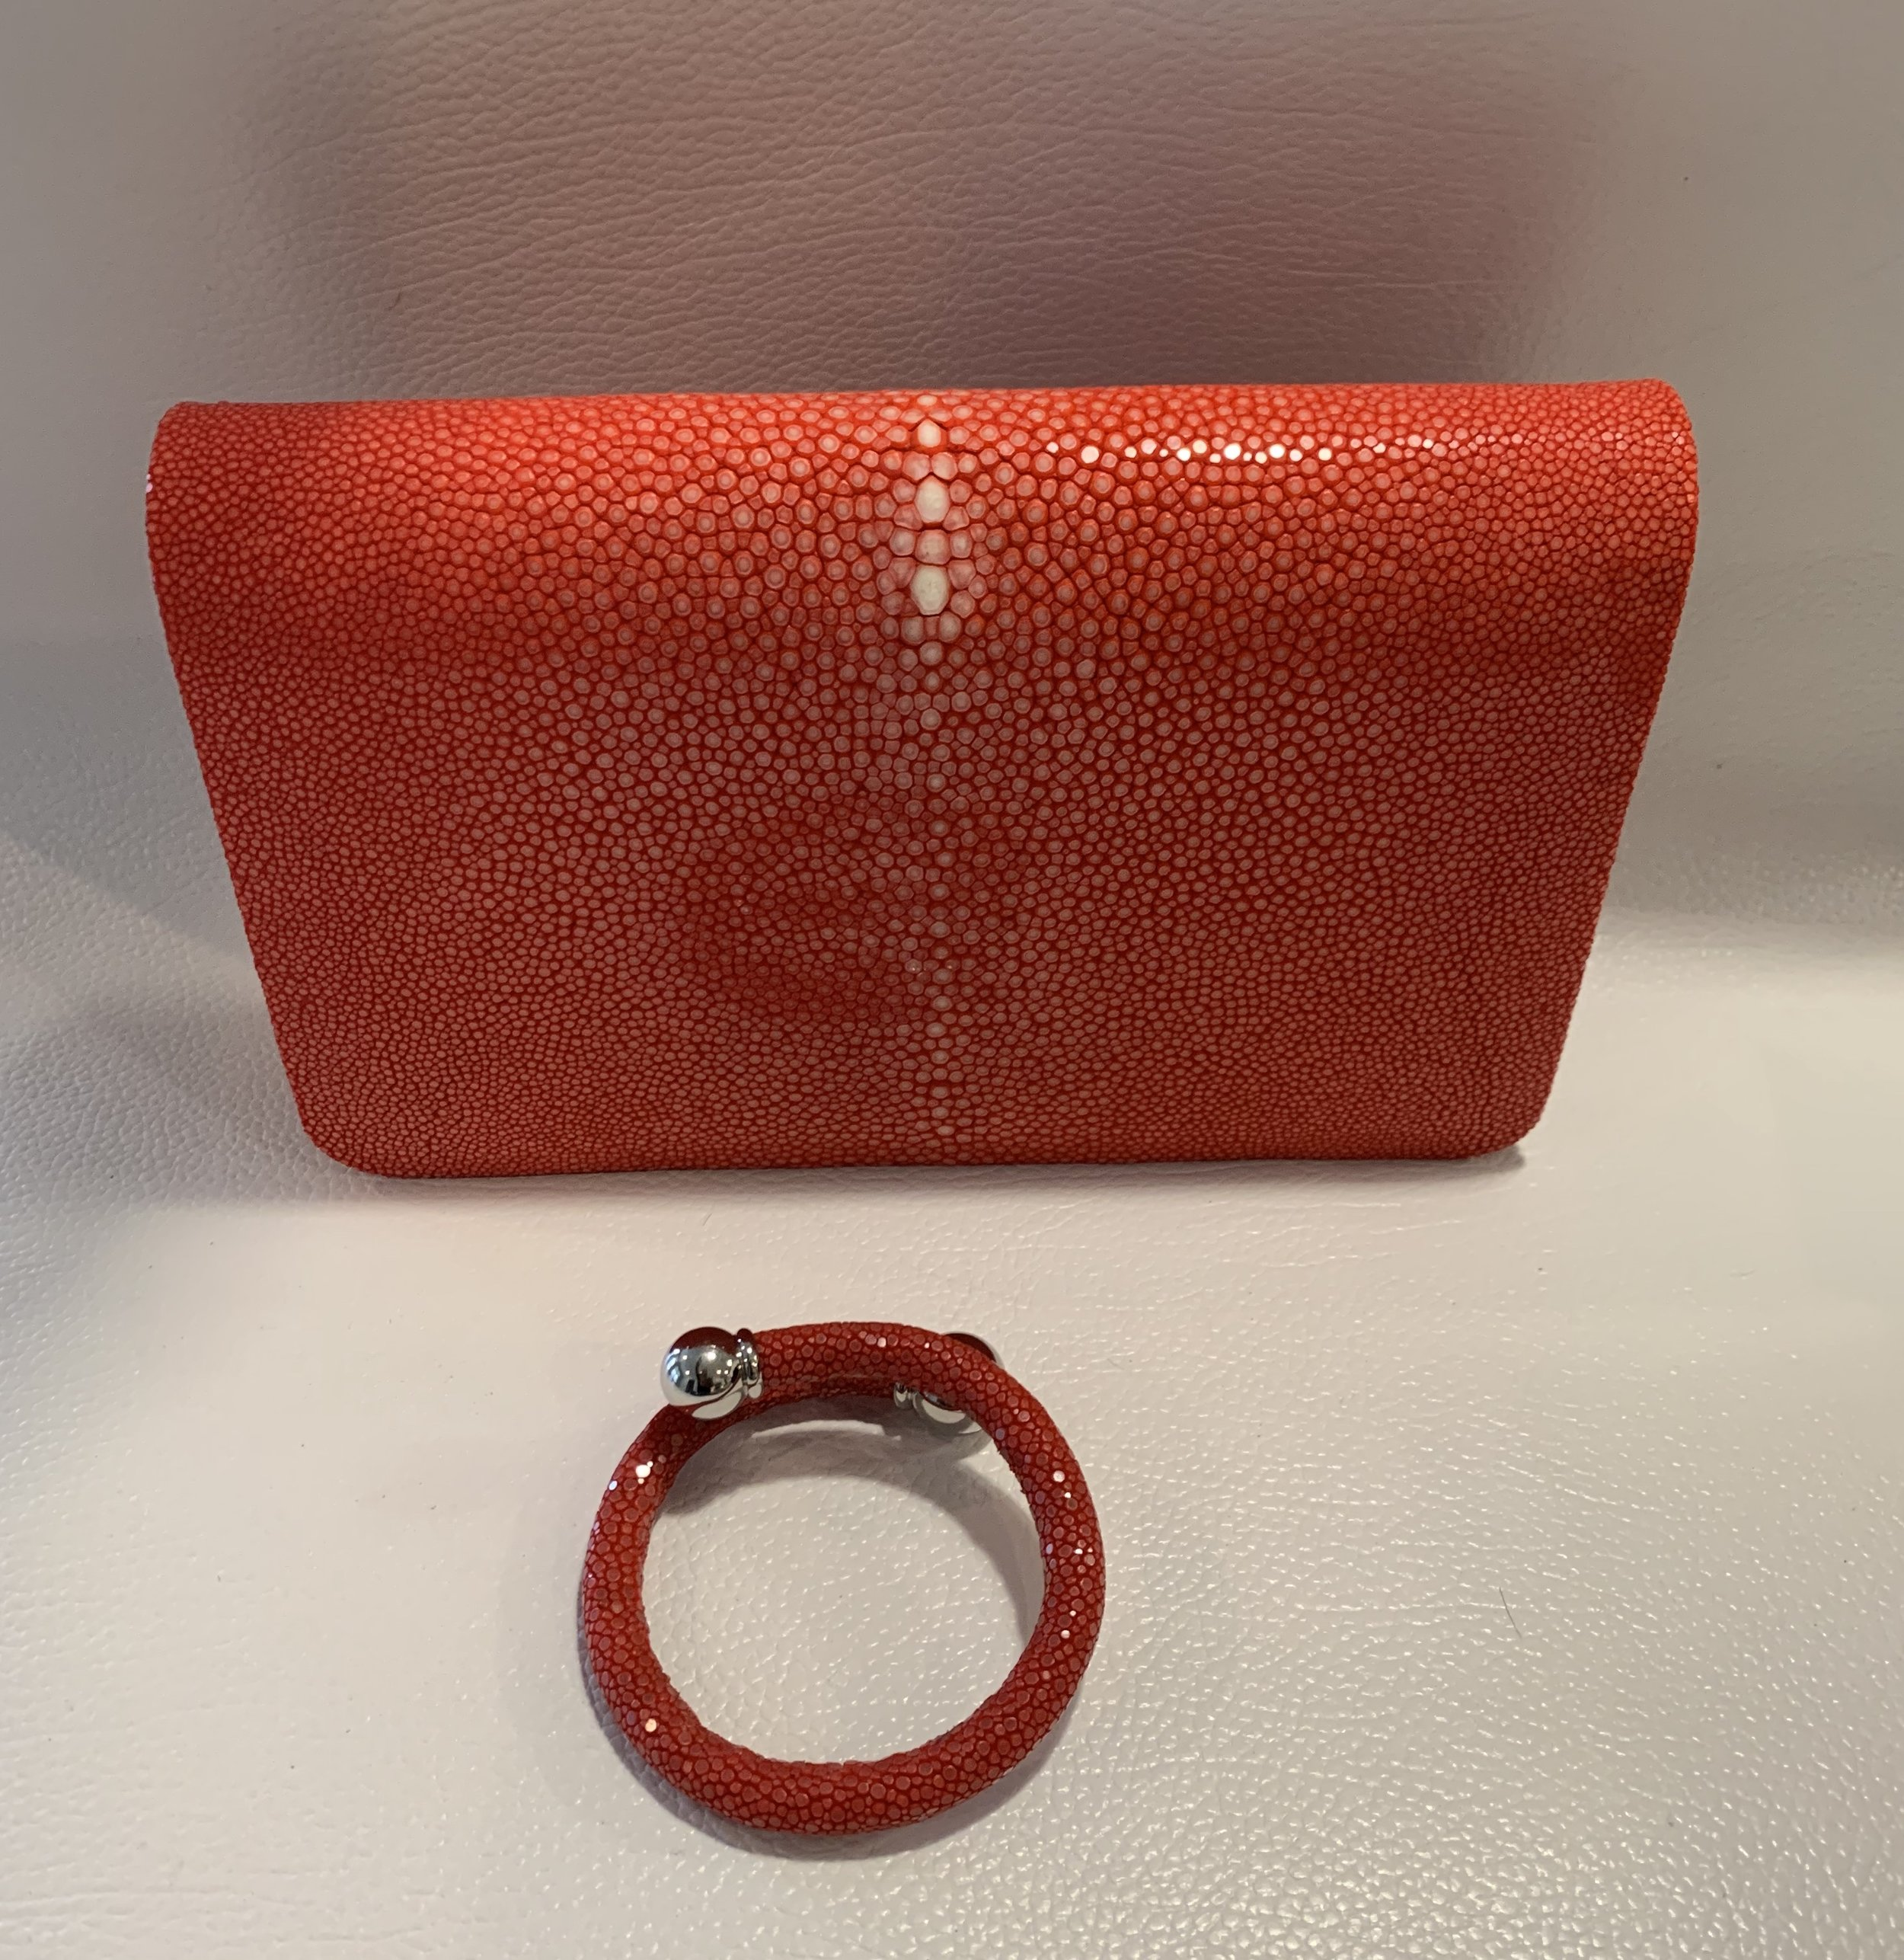 Timeless Stingray Bag/Clutch 699.00 699.00